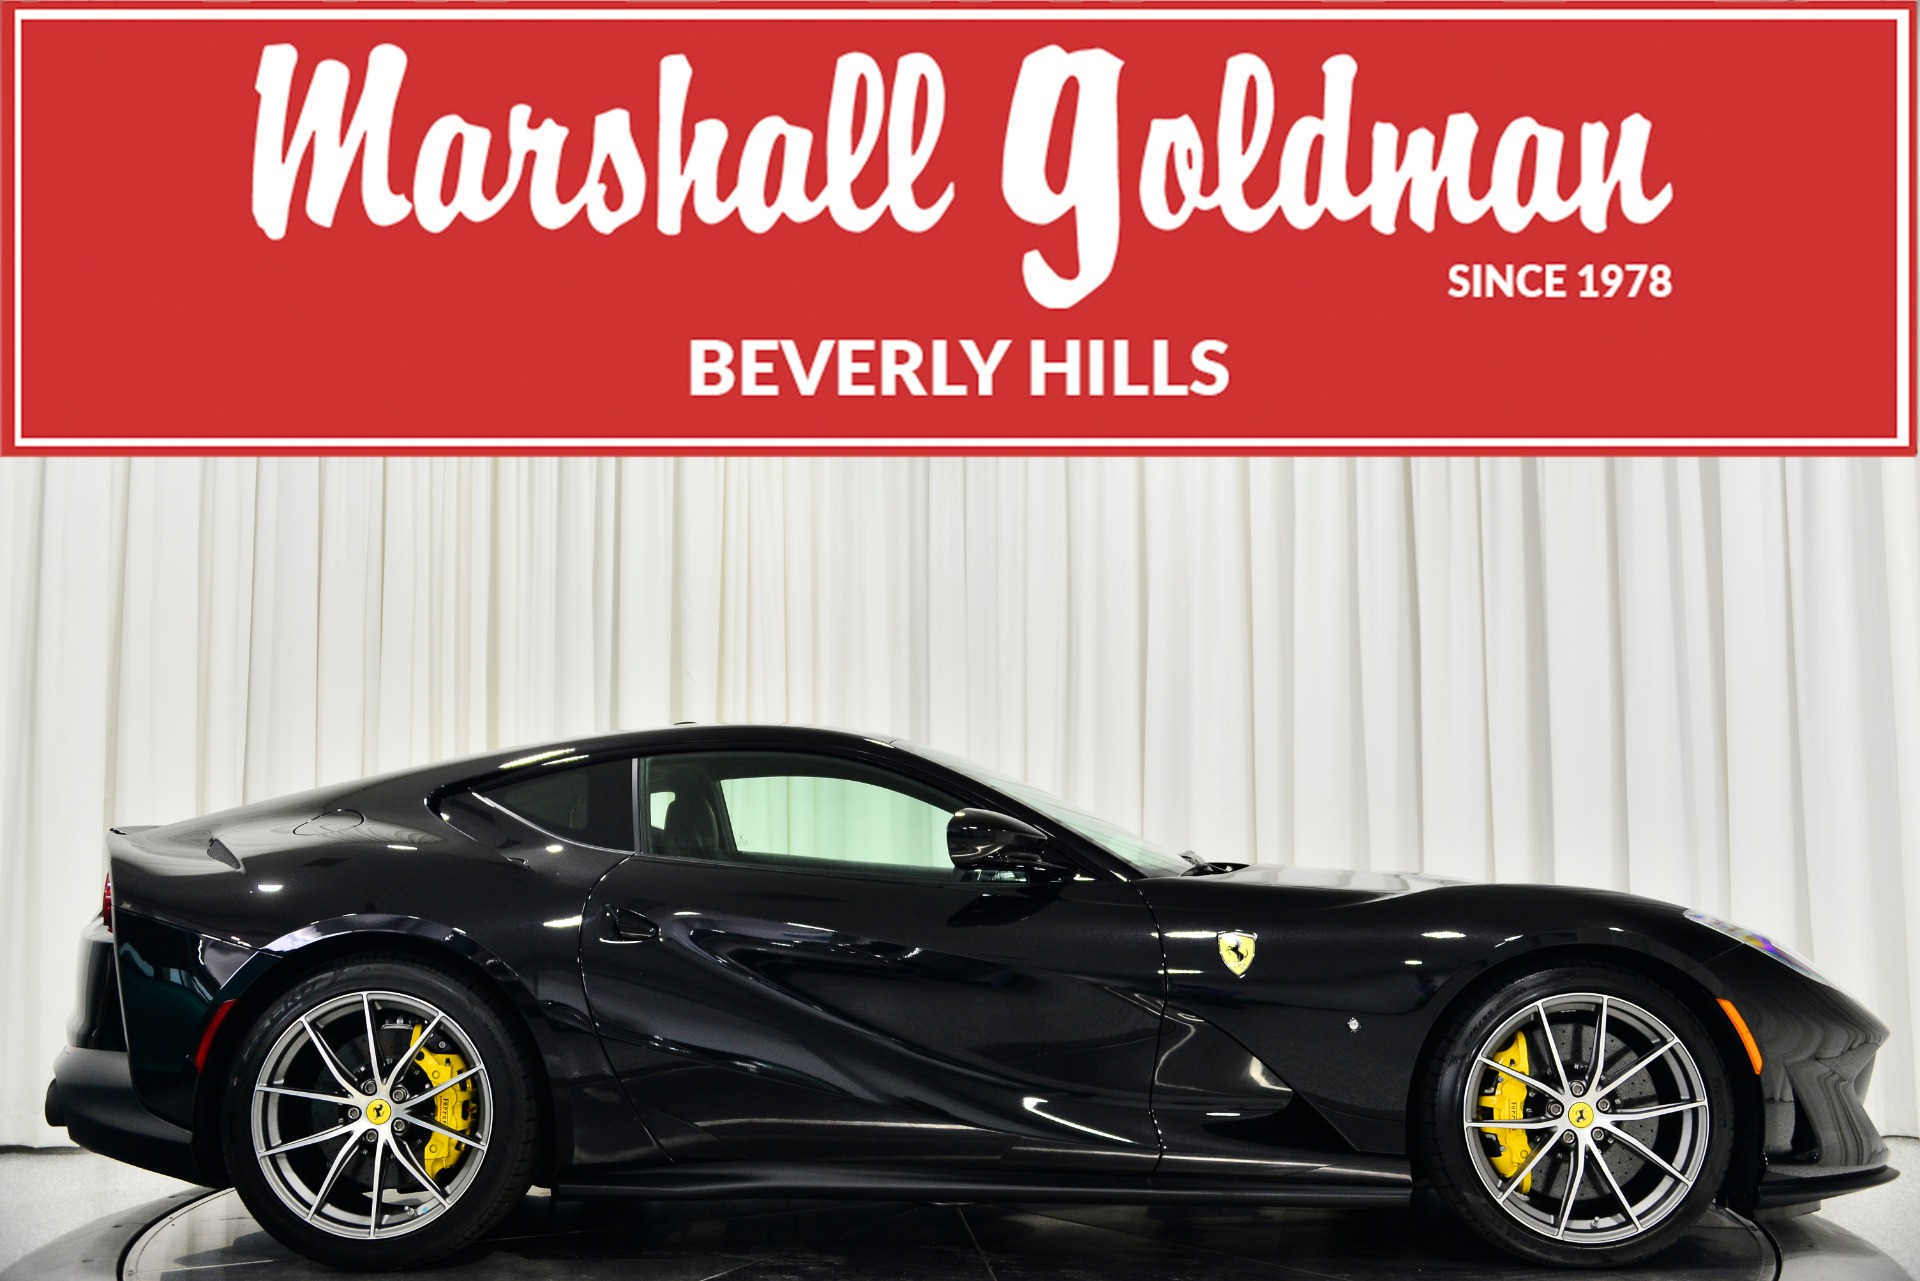 Used 2020 Ferrari 812 Superfast For Sale Sold Marshall Goldman Cleveland Stock B21167